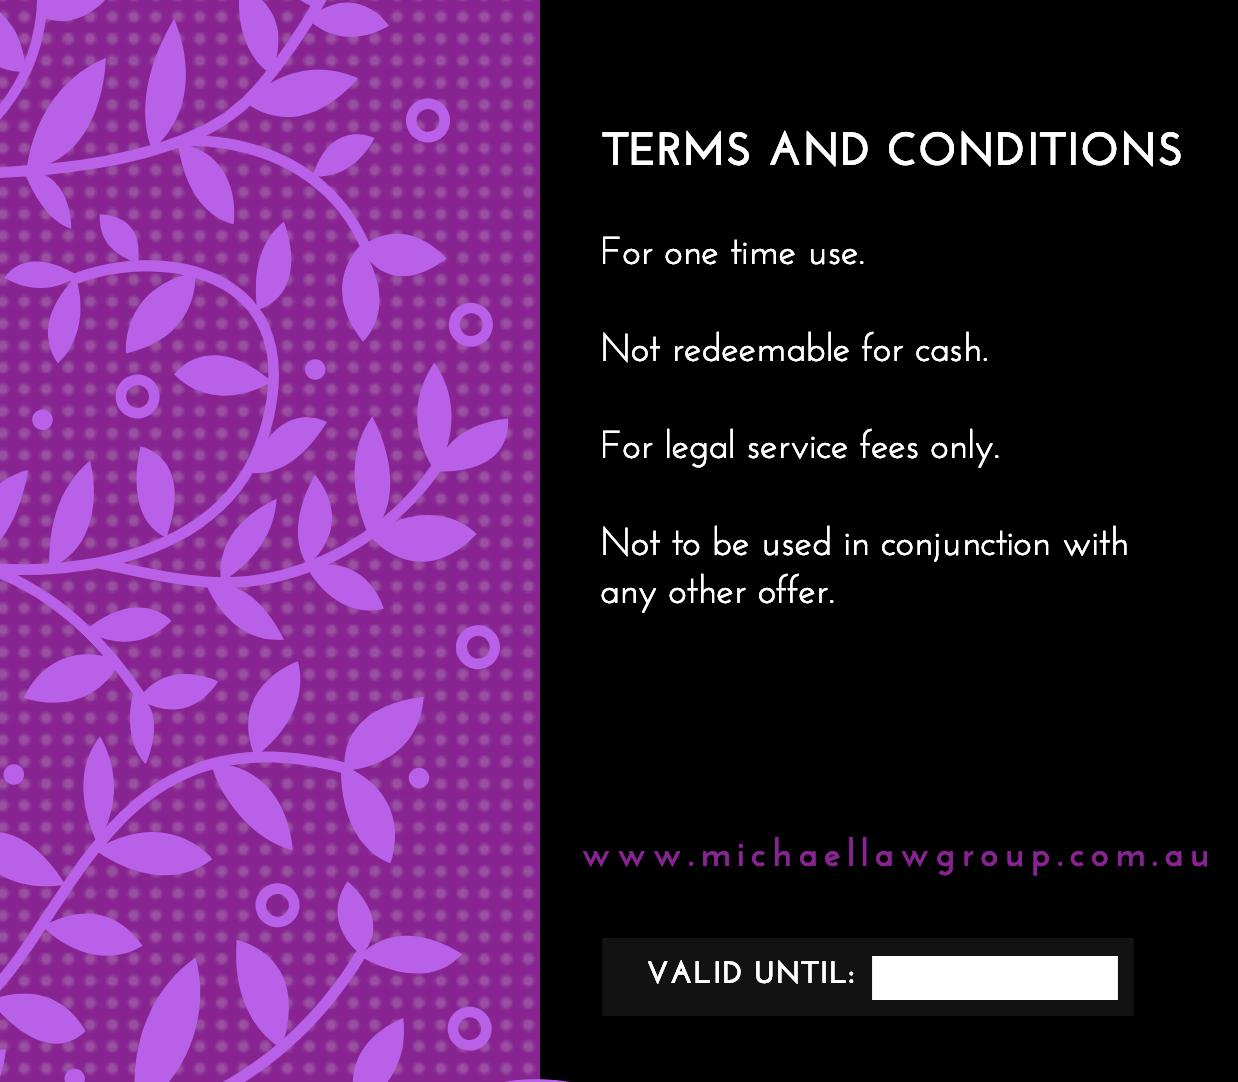 Legal tips for Australian promotions